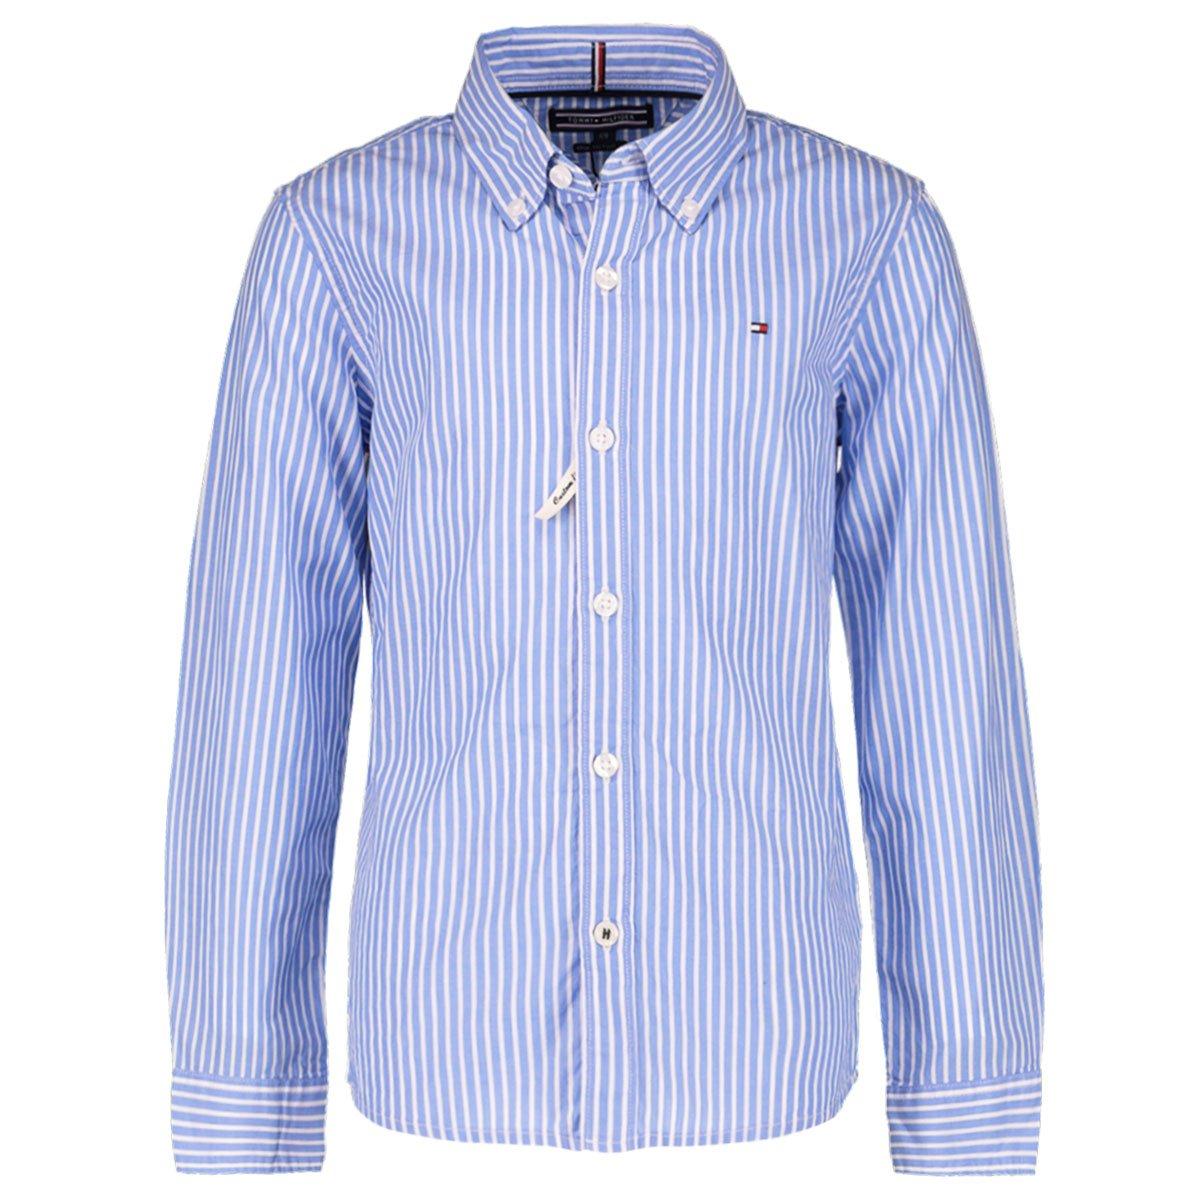 Tommy Hilfiger Jungen Hemd Boys Blue Stripe Langarm